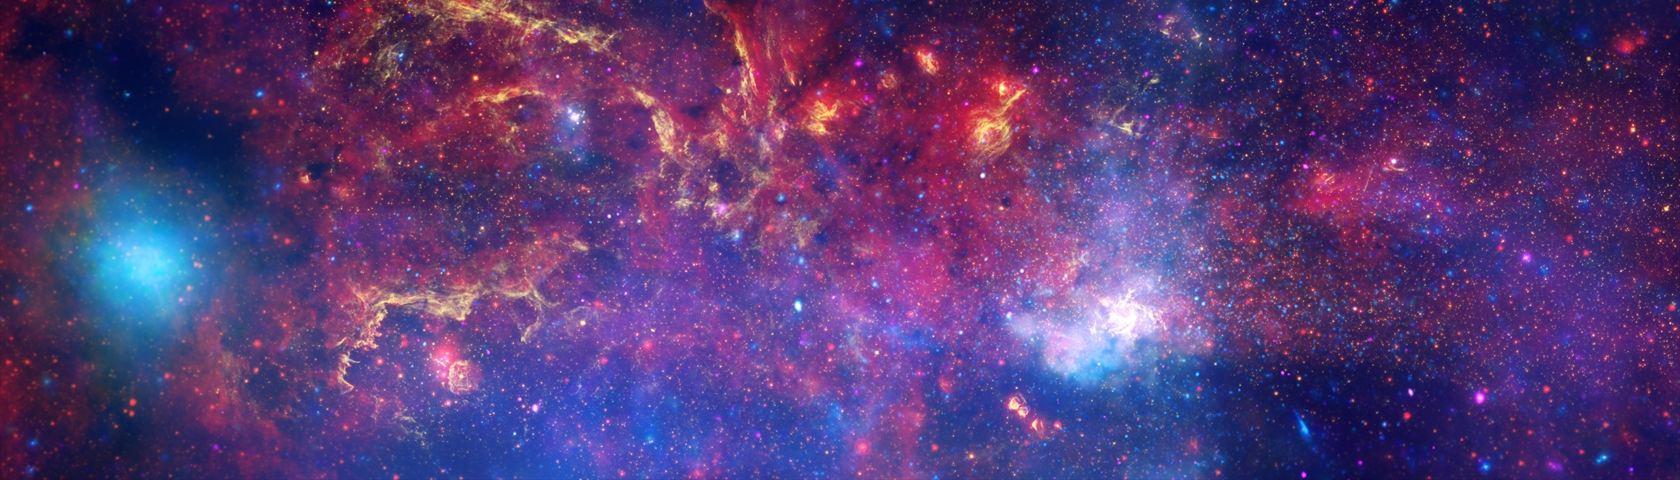 Galactic Center